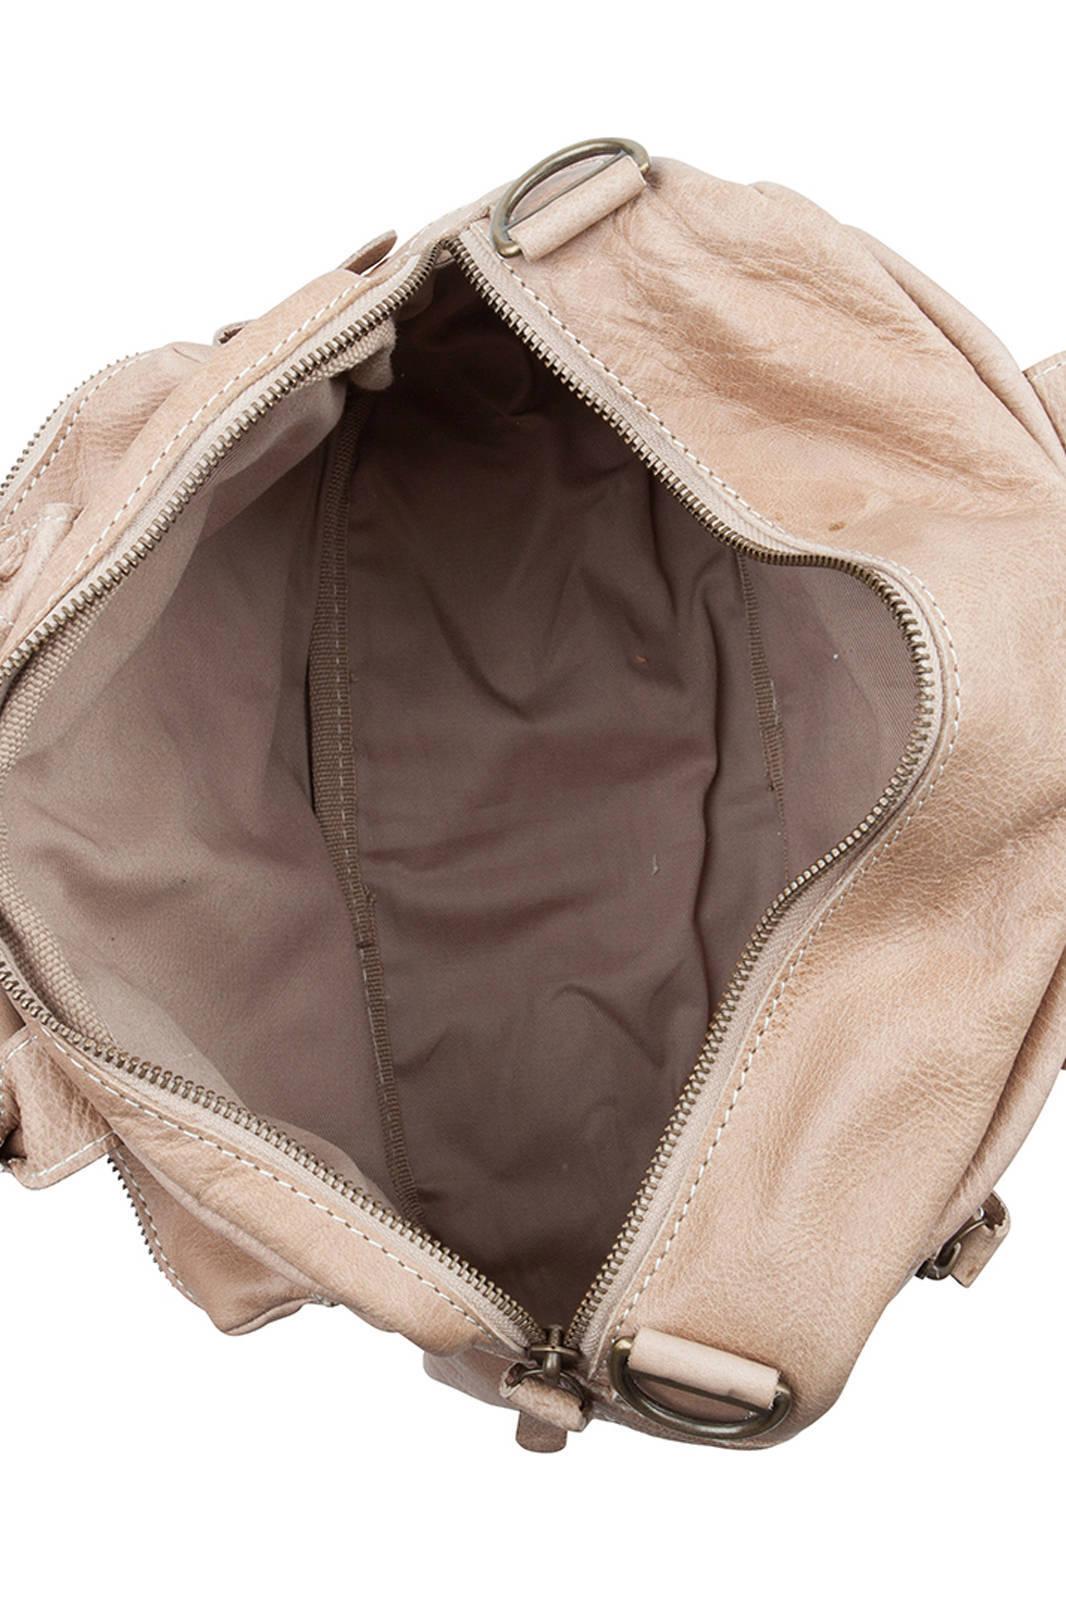 58fe64cdd95 Cowboysbag leren tas The Little Bag   wehkamp